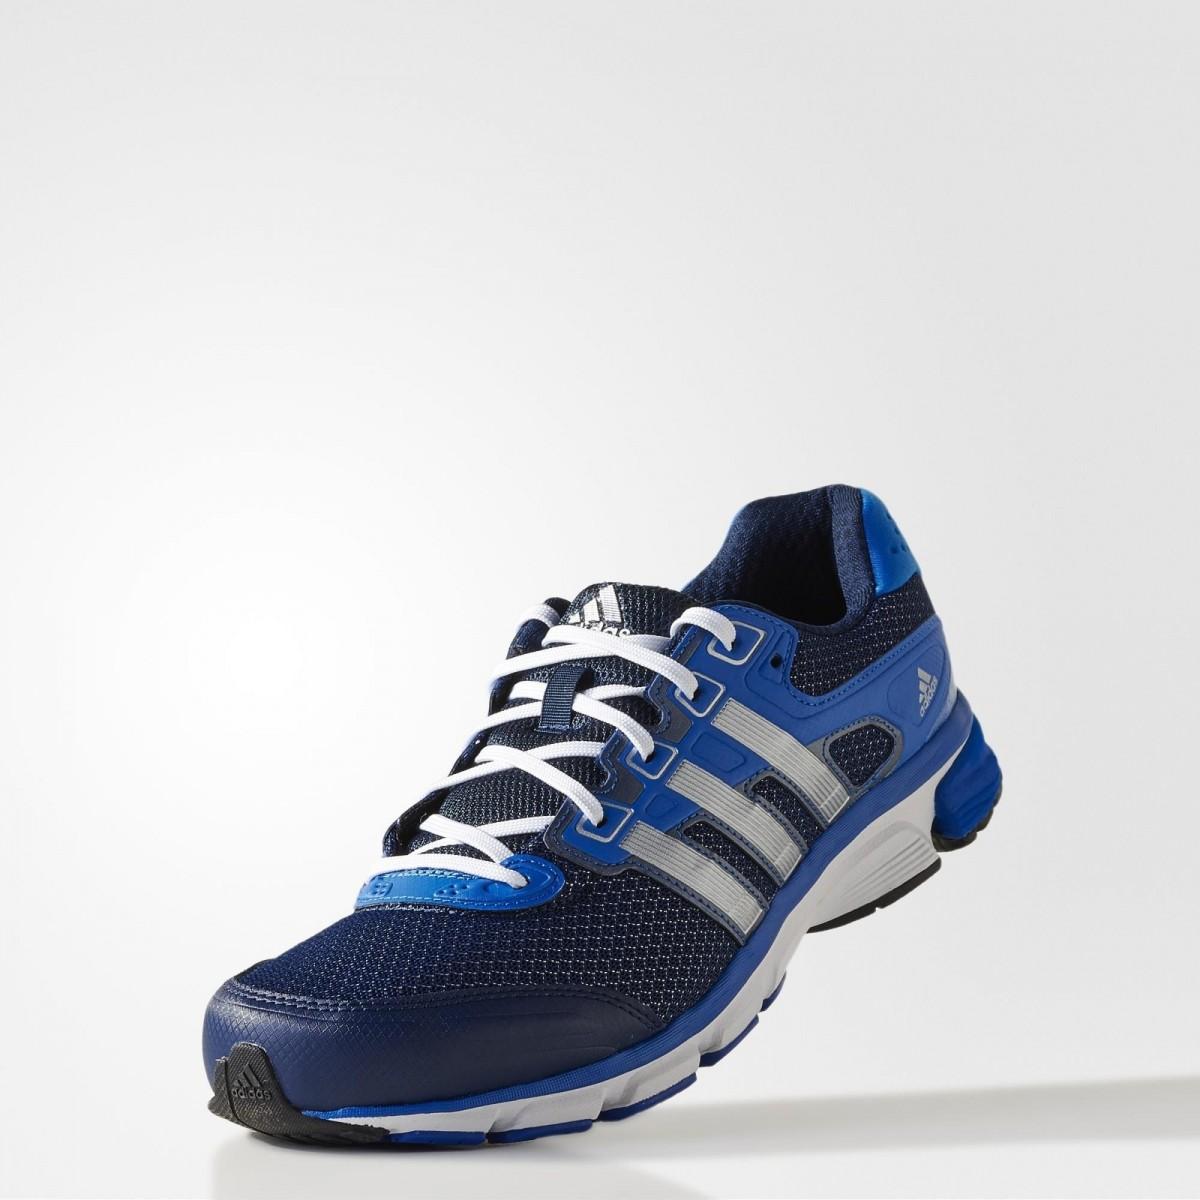 a0037b5ee88 Bizz Store - Tênis Adidas S81703 Nova Cushion Masculino Academia